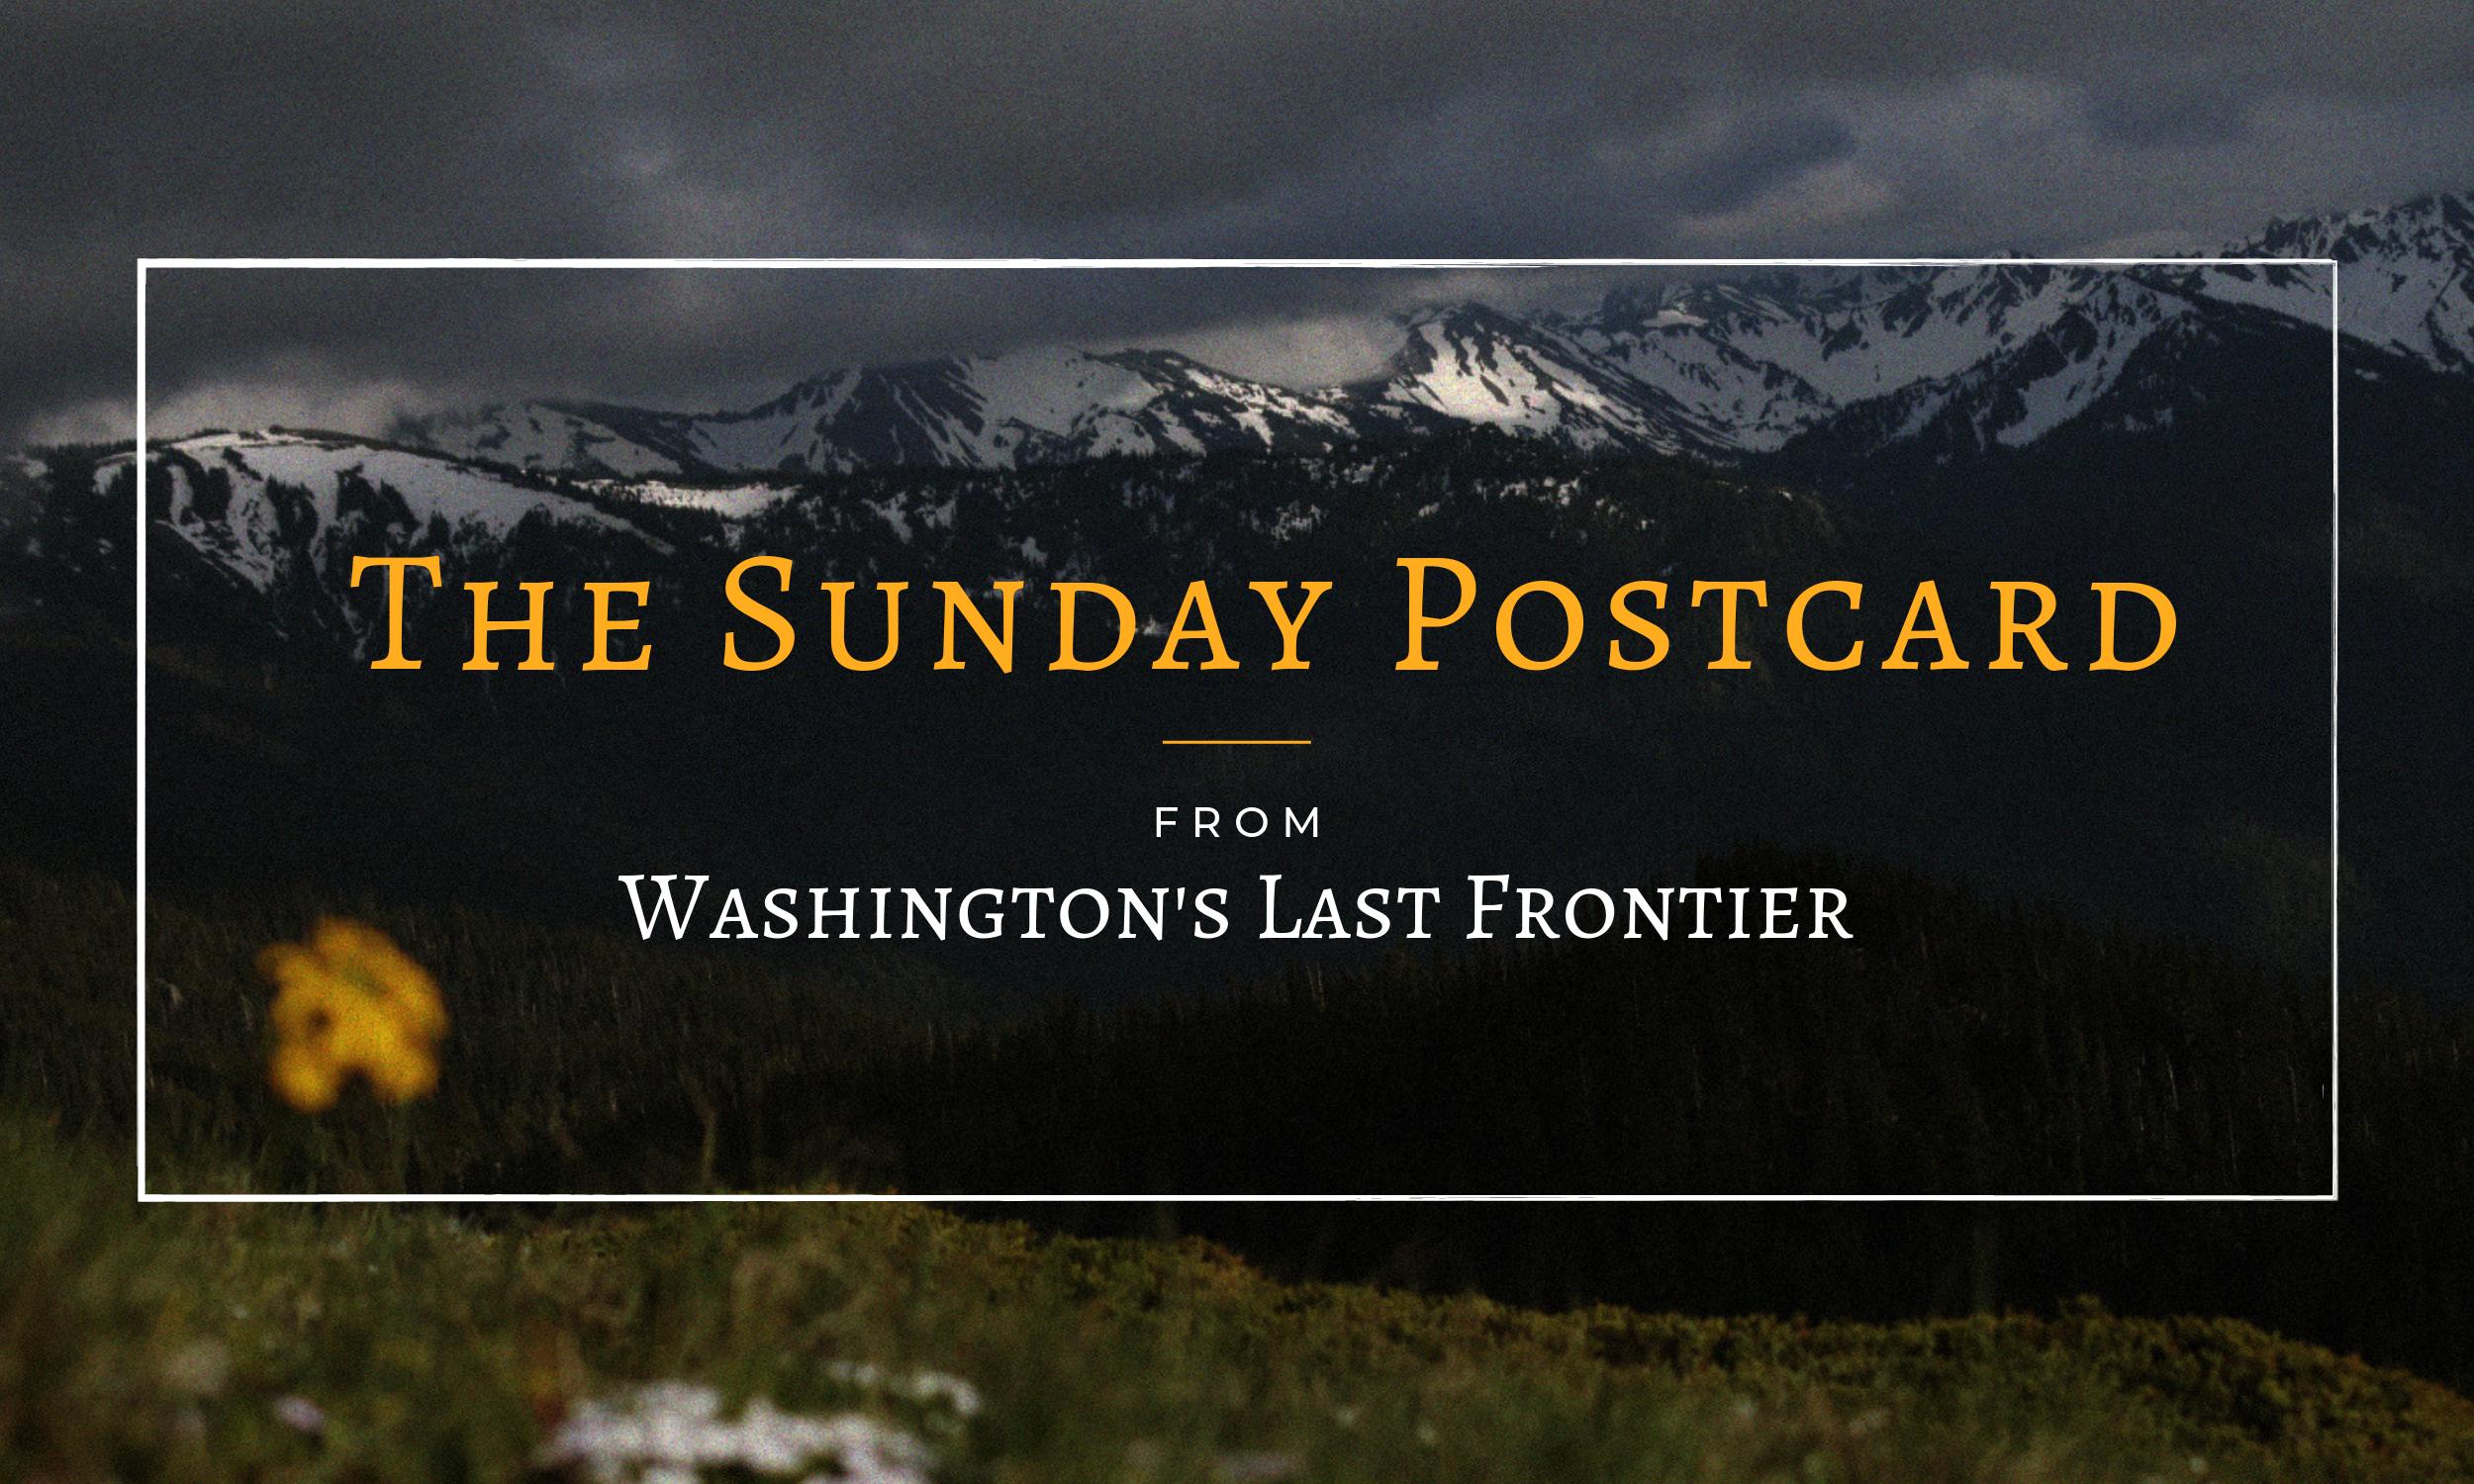 Washington's Last Frontier Sunday Postcard.png